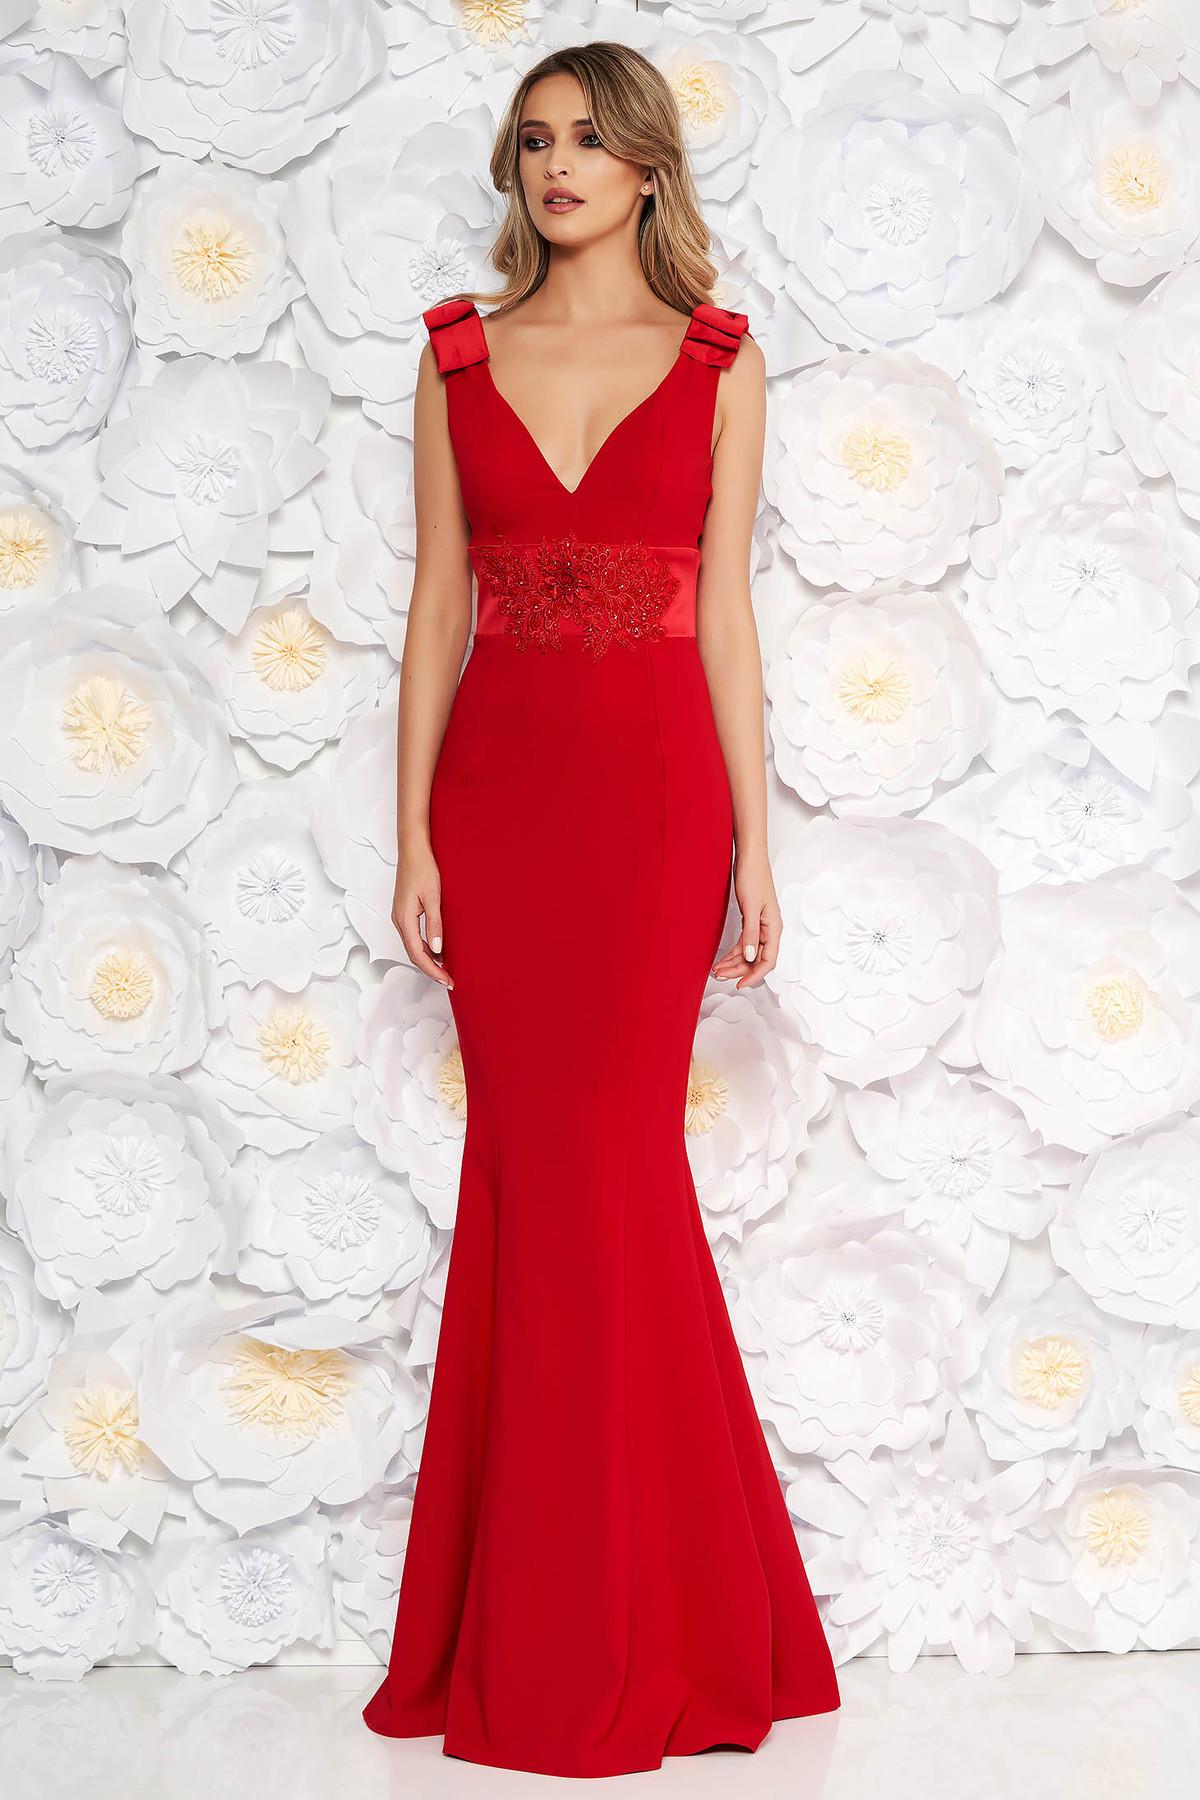 Rochie rosie de ocazie lunga tip sirena din stofa subtire usor elastica accesorizata cu fundite cu aplicatii de dantela